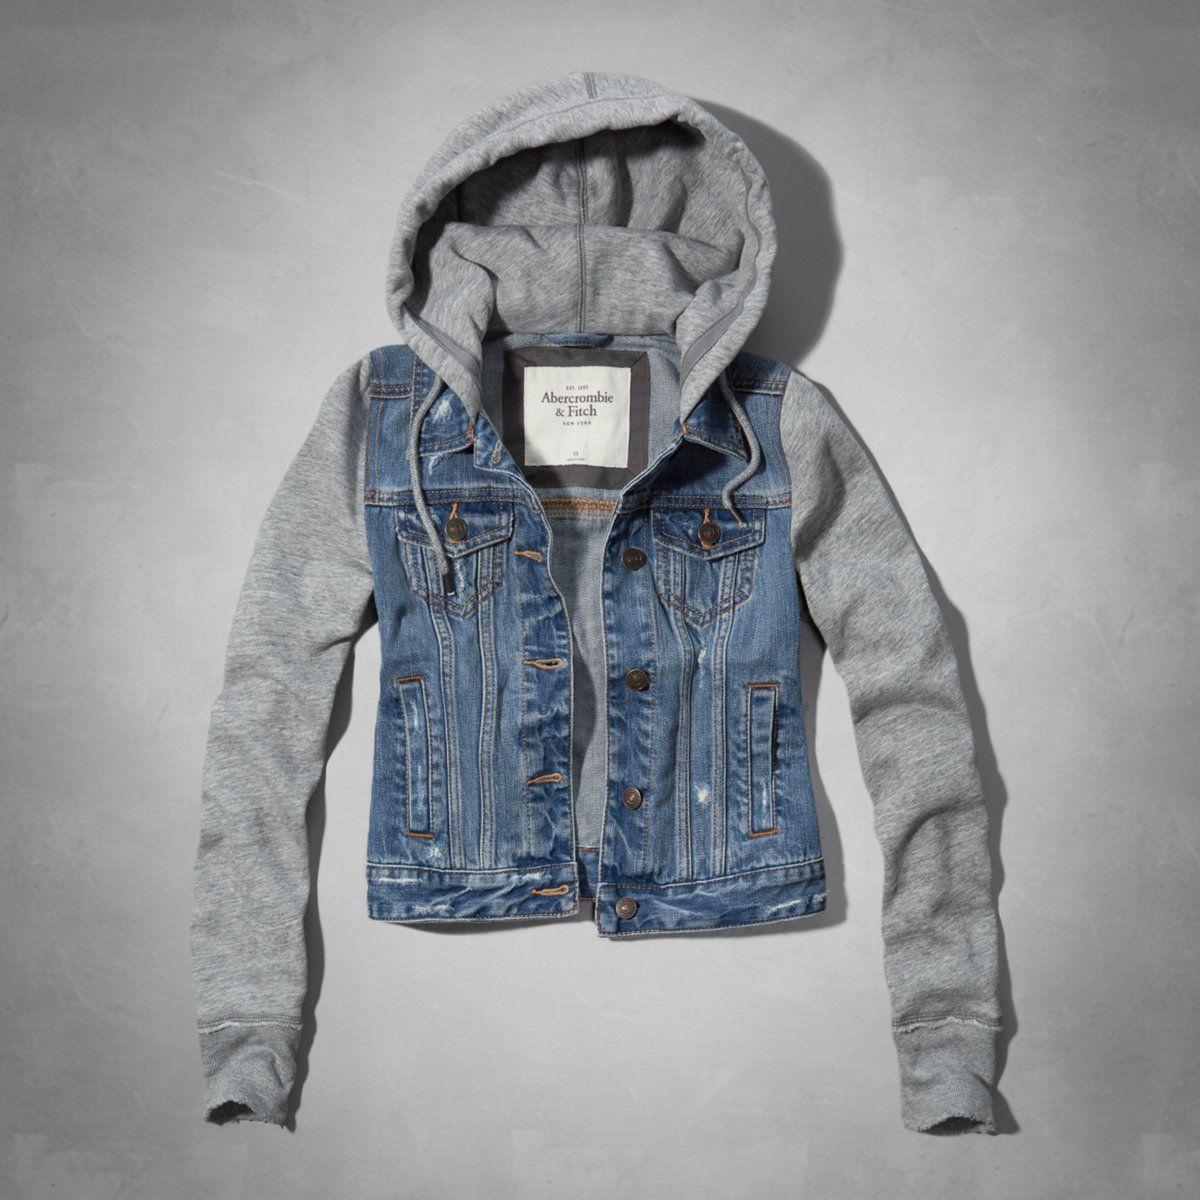 Womens Marisa Denim And Fleece Jacket Womens Outerwear Eu Abercrombie Com Fleece Jacket Womens Denim Jacket Women Outerwear Women [ 1200 x 1200 Pixel ]